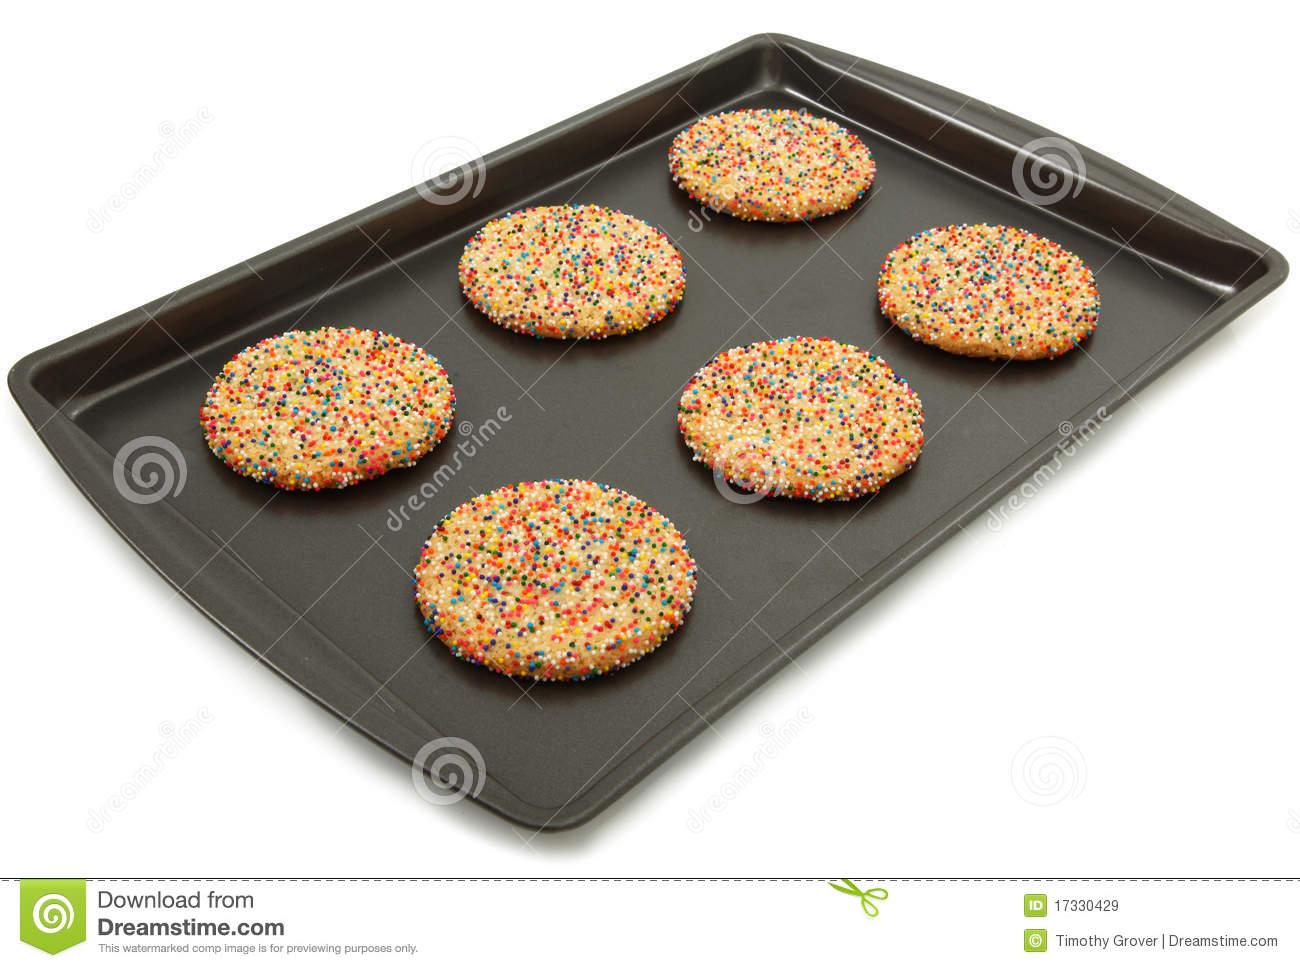 Cookies on clip art. Baking sheet food clipart